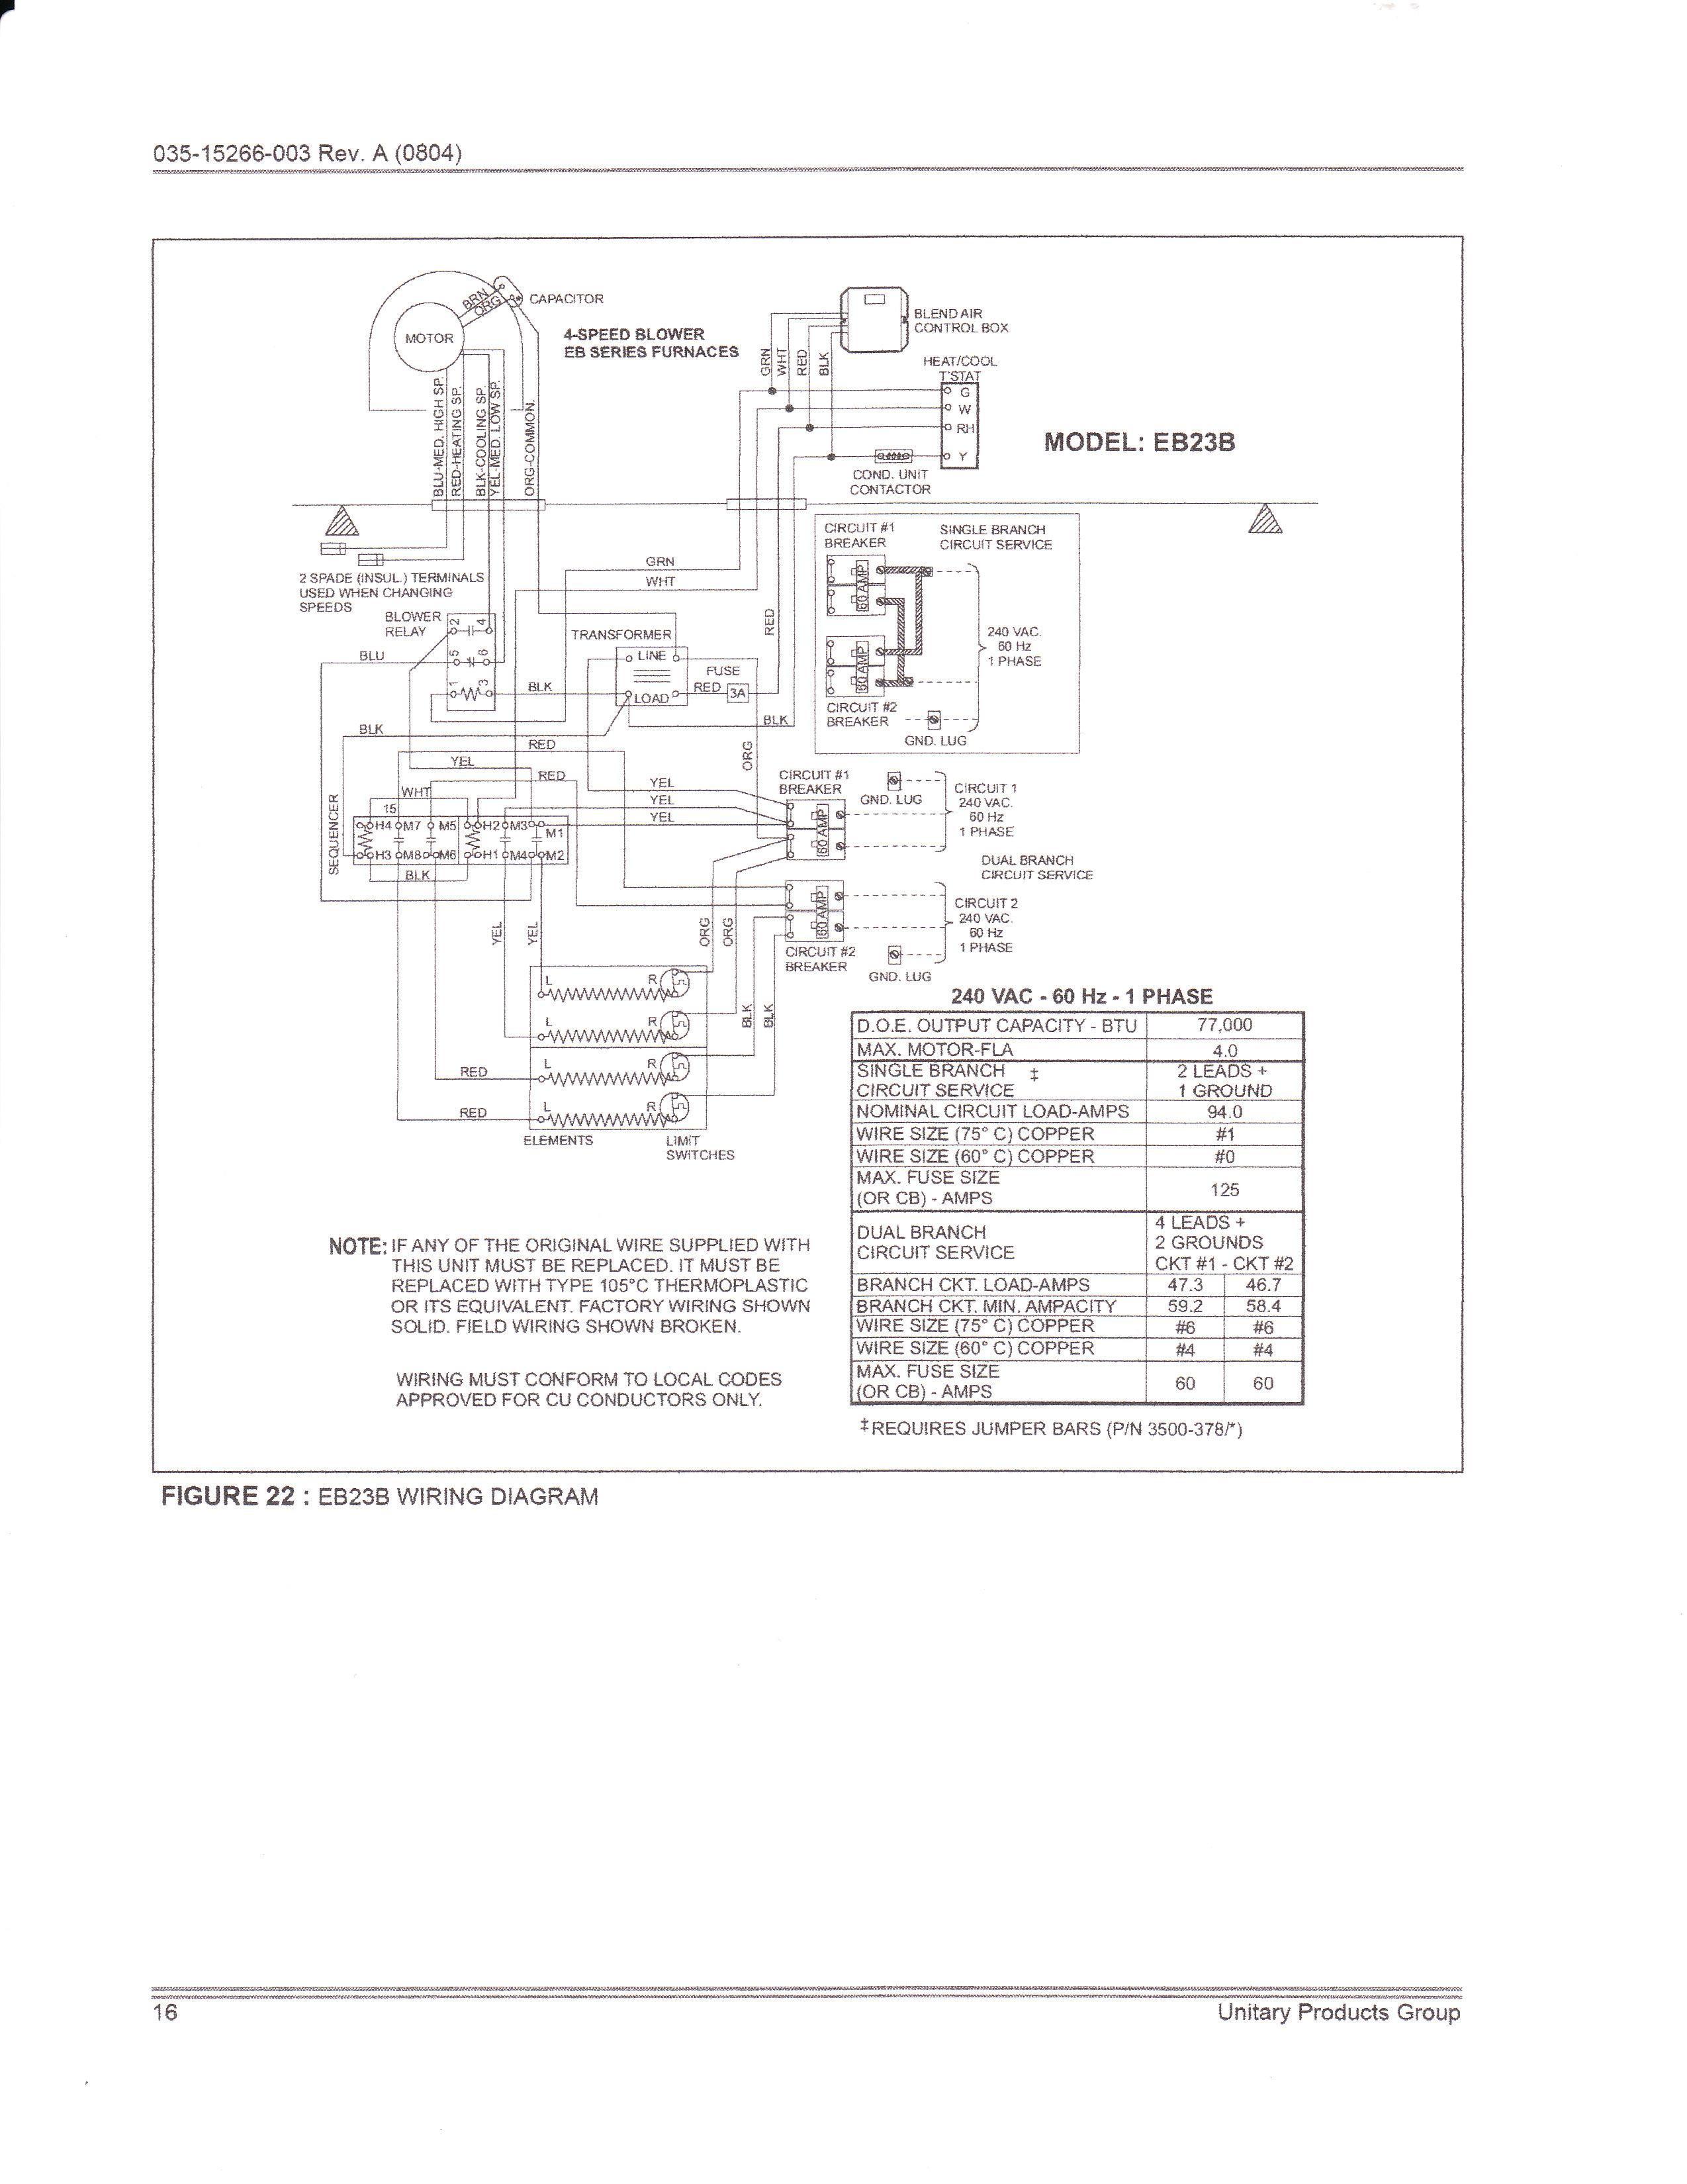 Wiring Diagram For Coleman Heat Pump | Wiring Diagram - Heat Sequencer Wiring Diagram